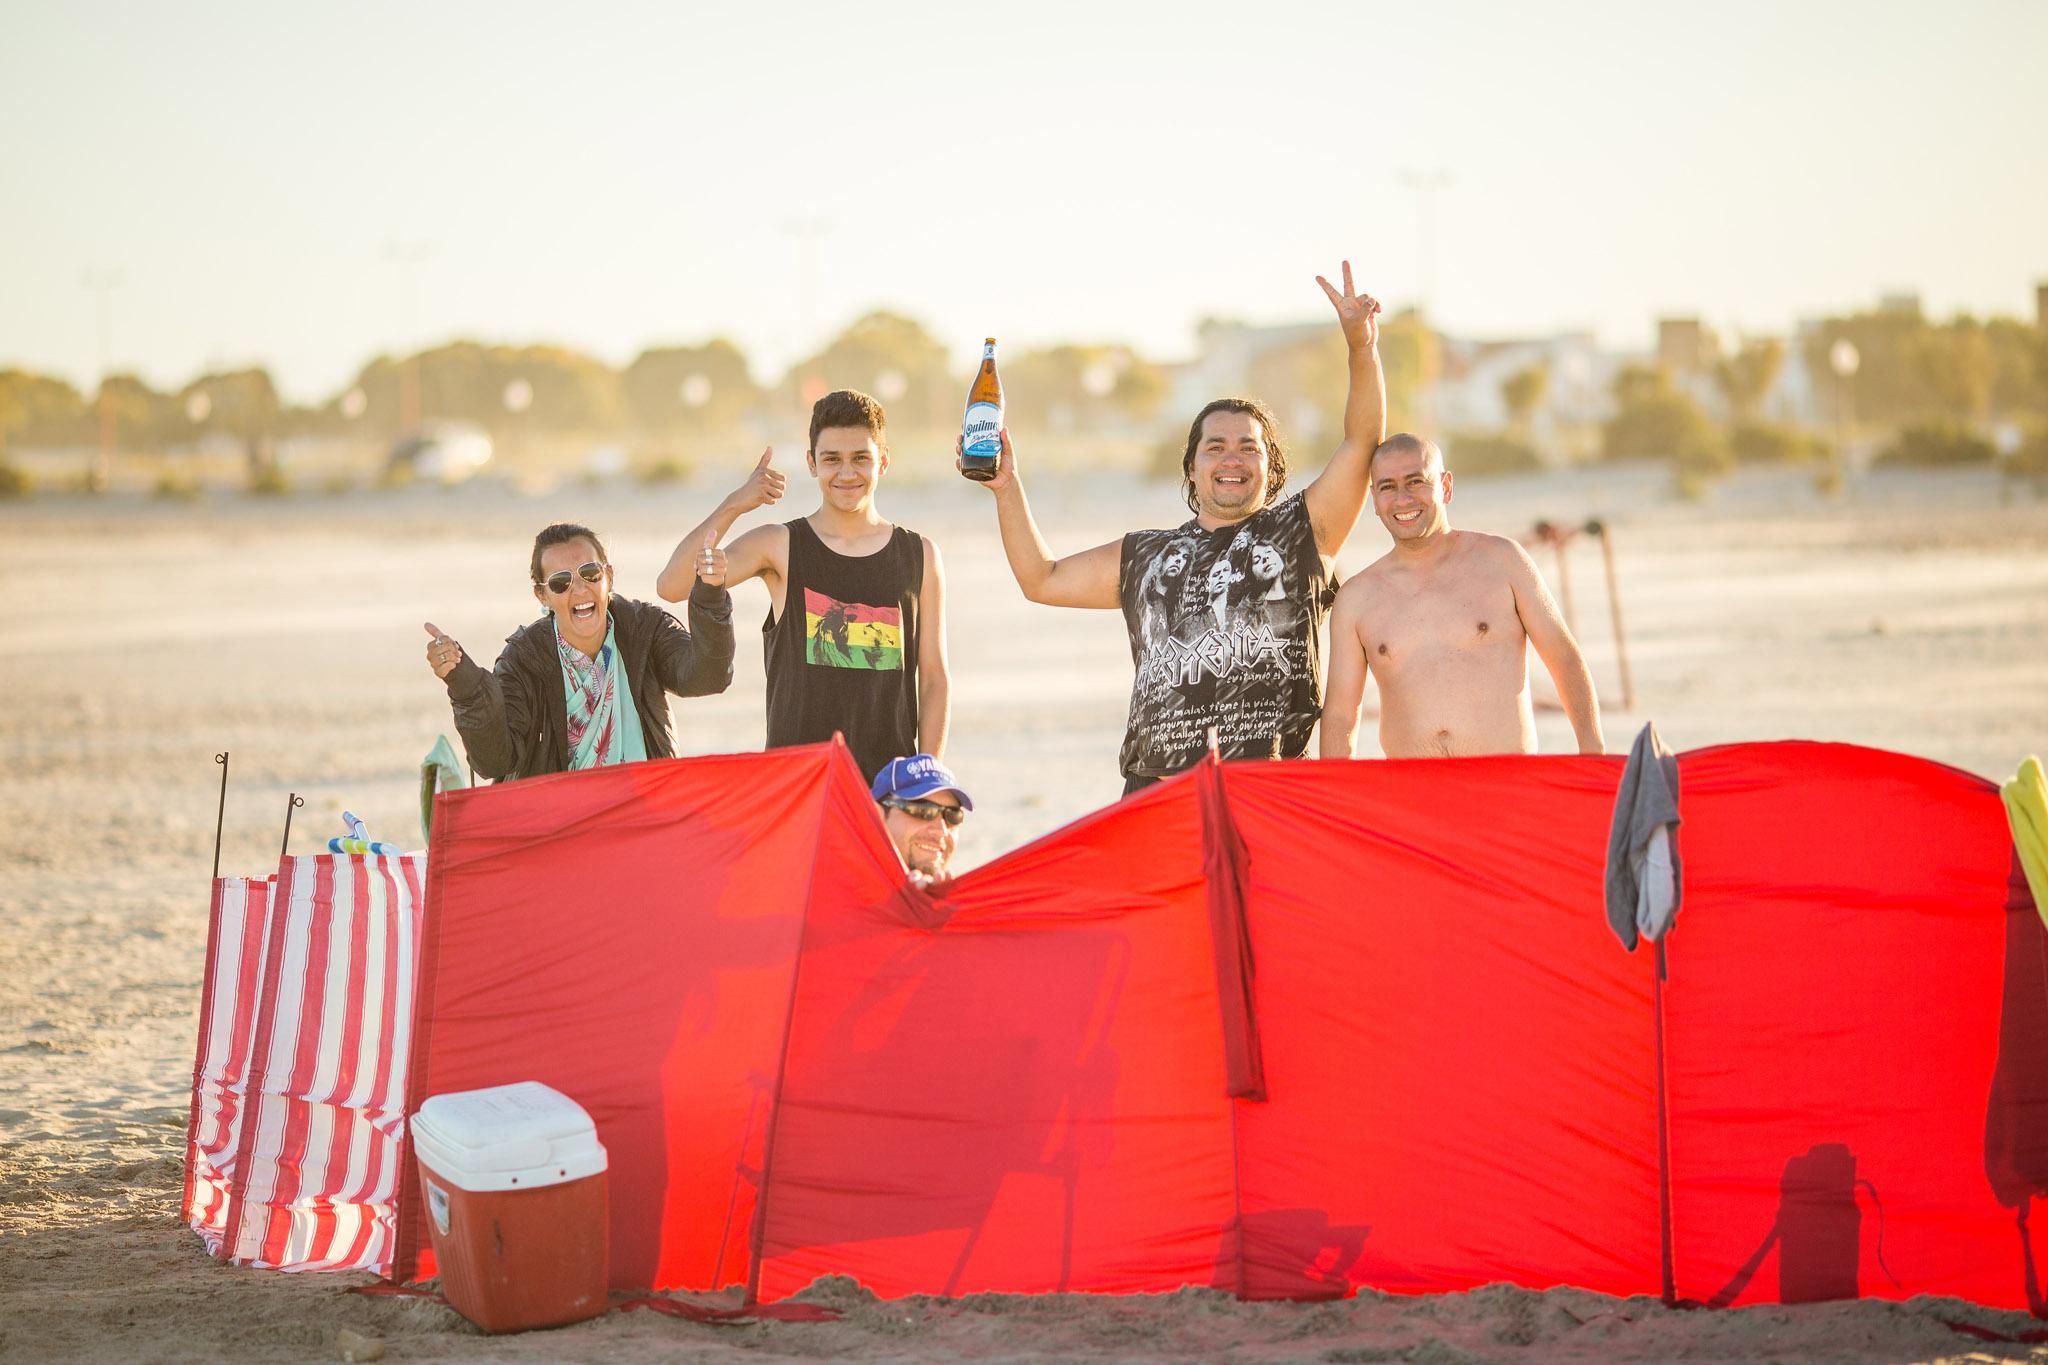 wedding-travellers-argentina-playas-doradas